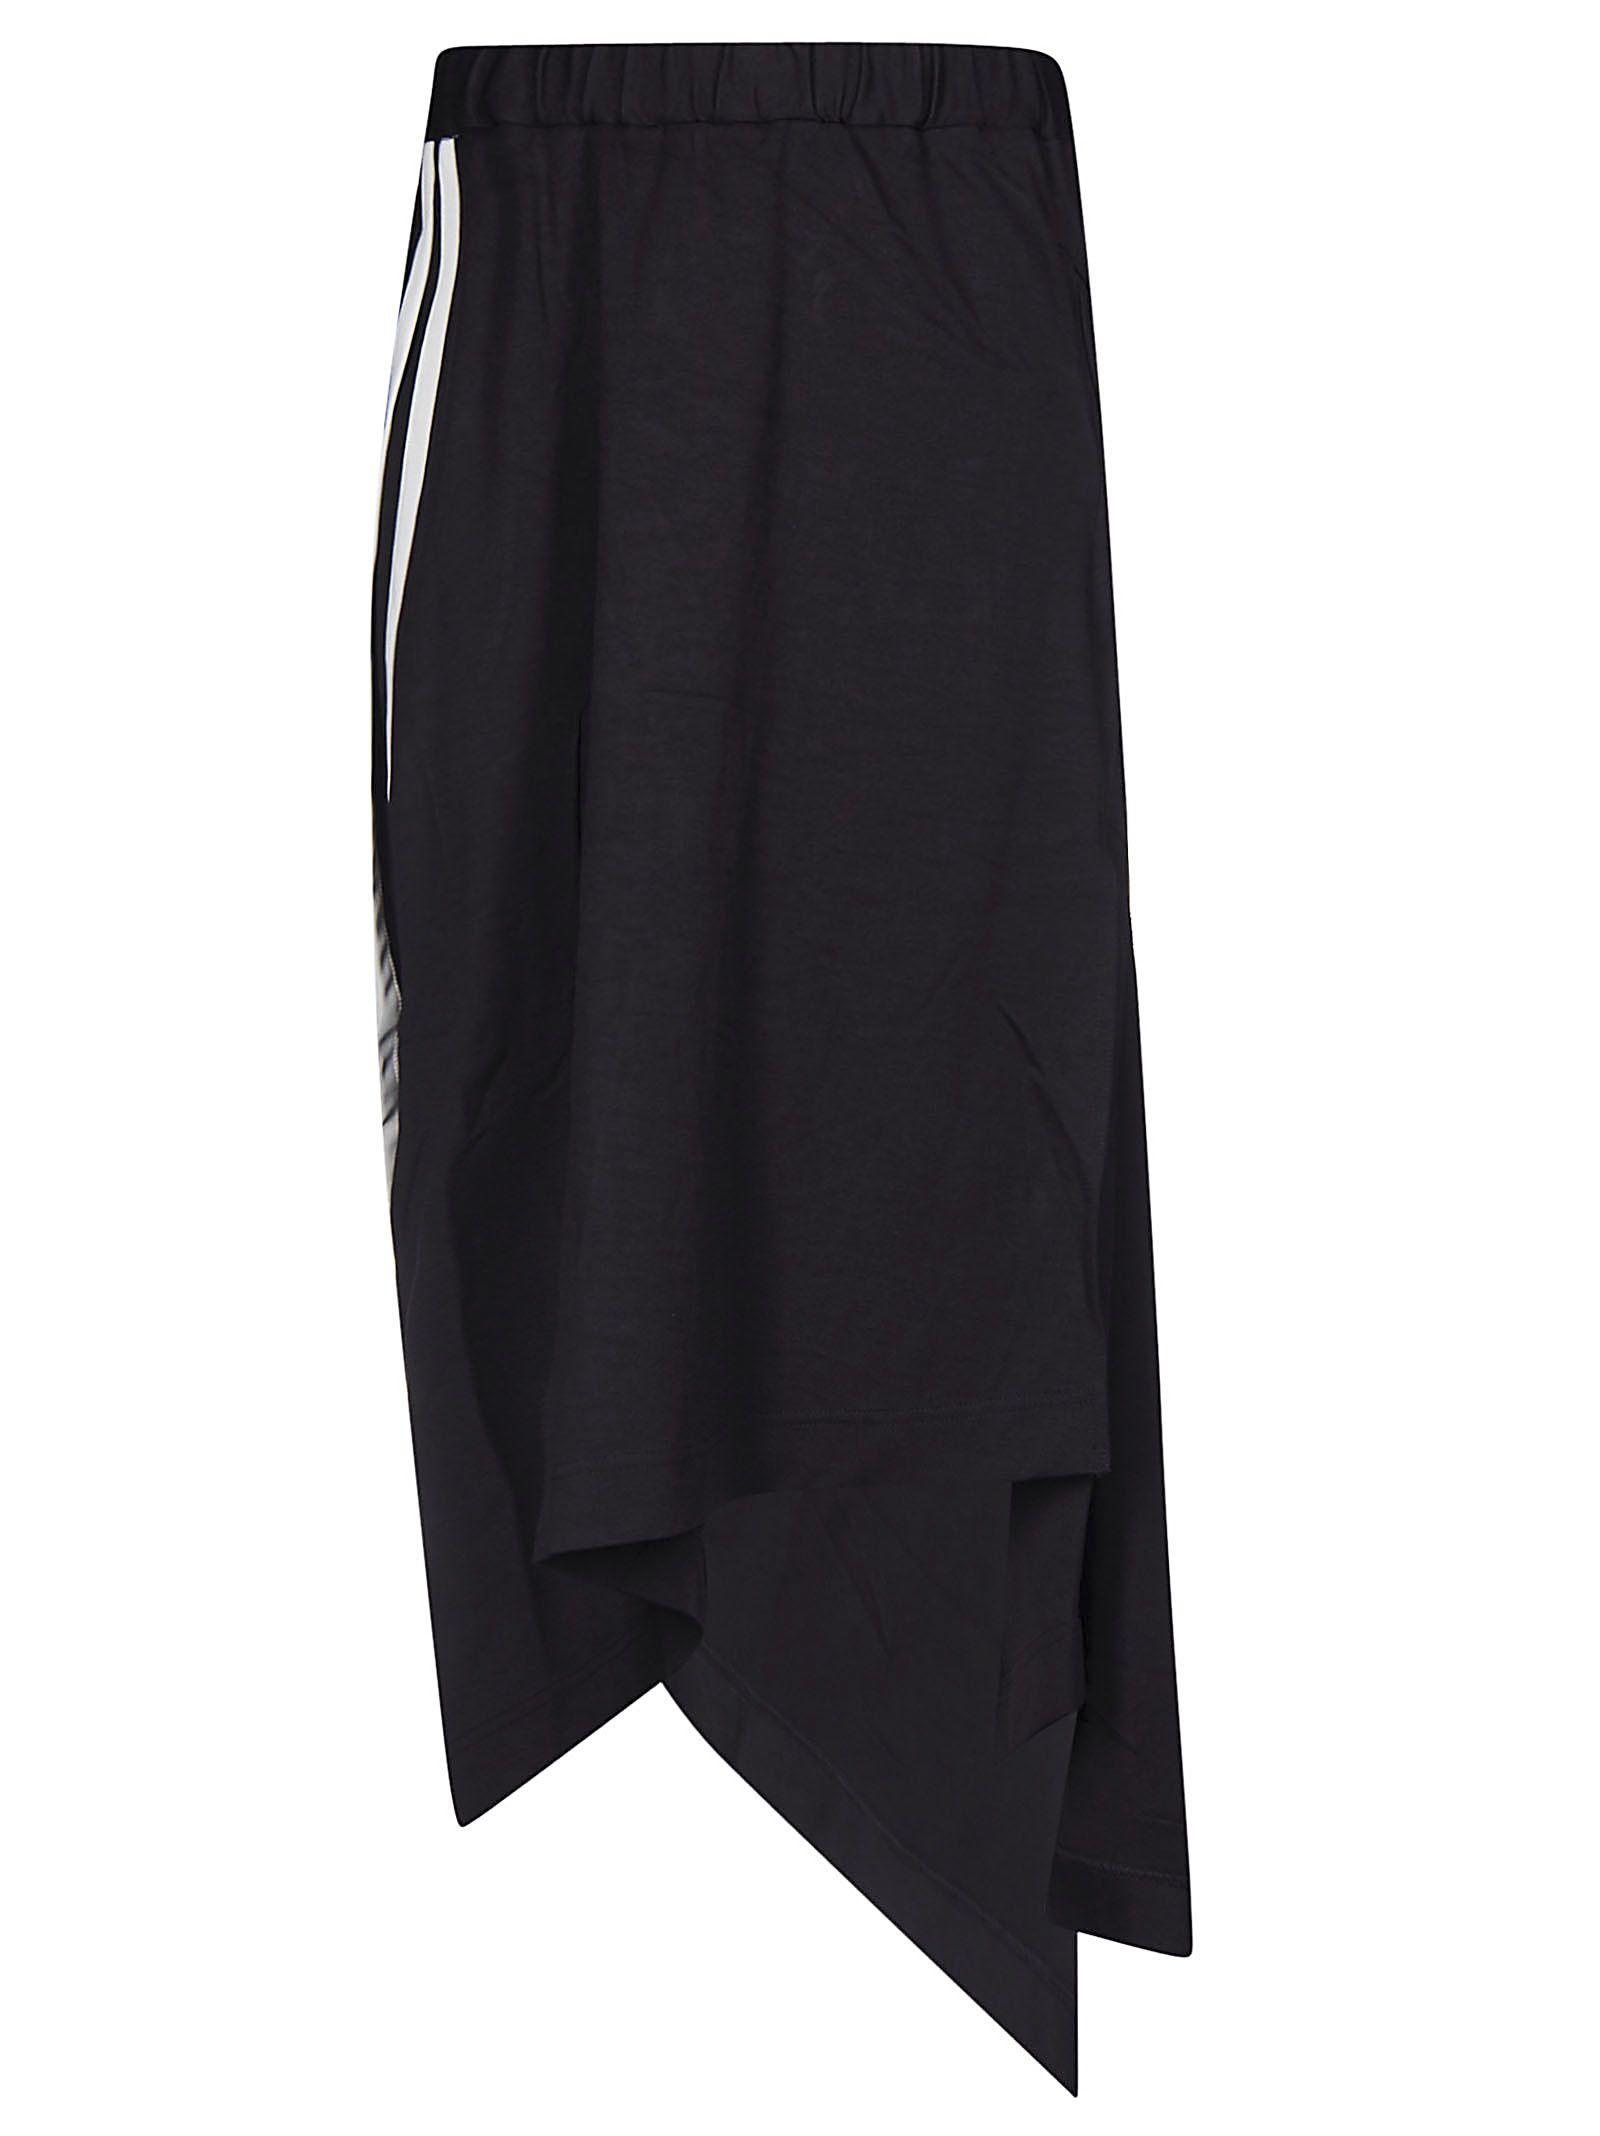 Y-3 Drape Skirt